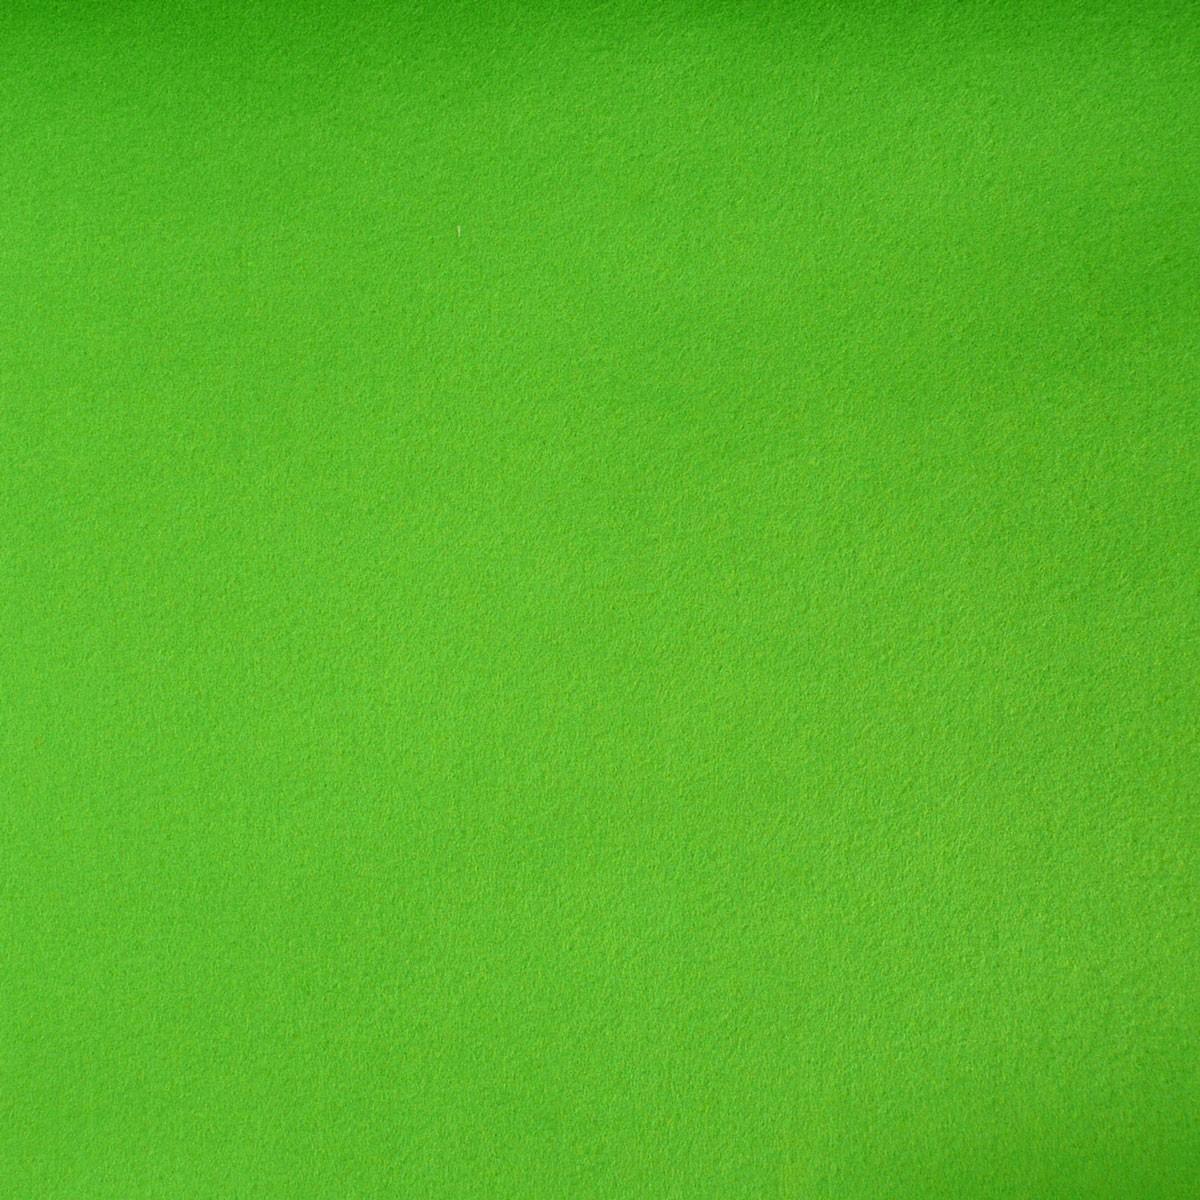 Kreativstoff Bastelfilz einfarbig apfelgrün 45cm Breite 4mm Stärke